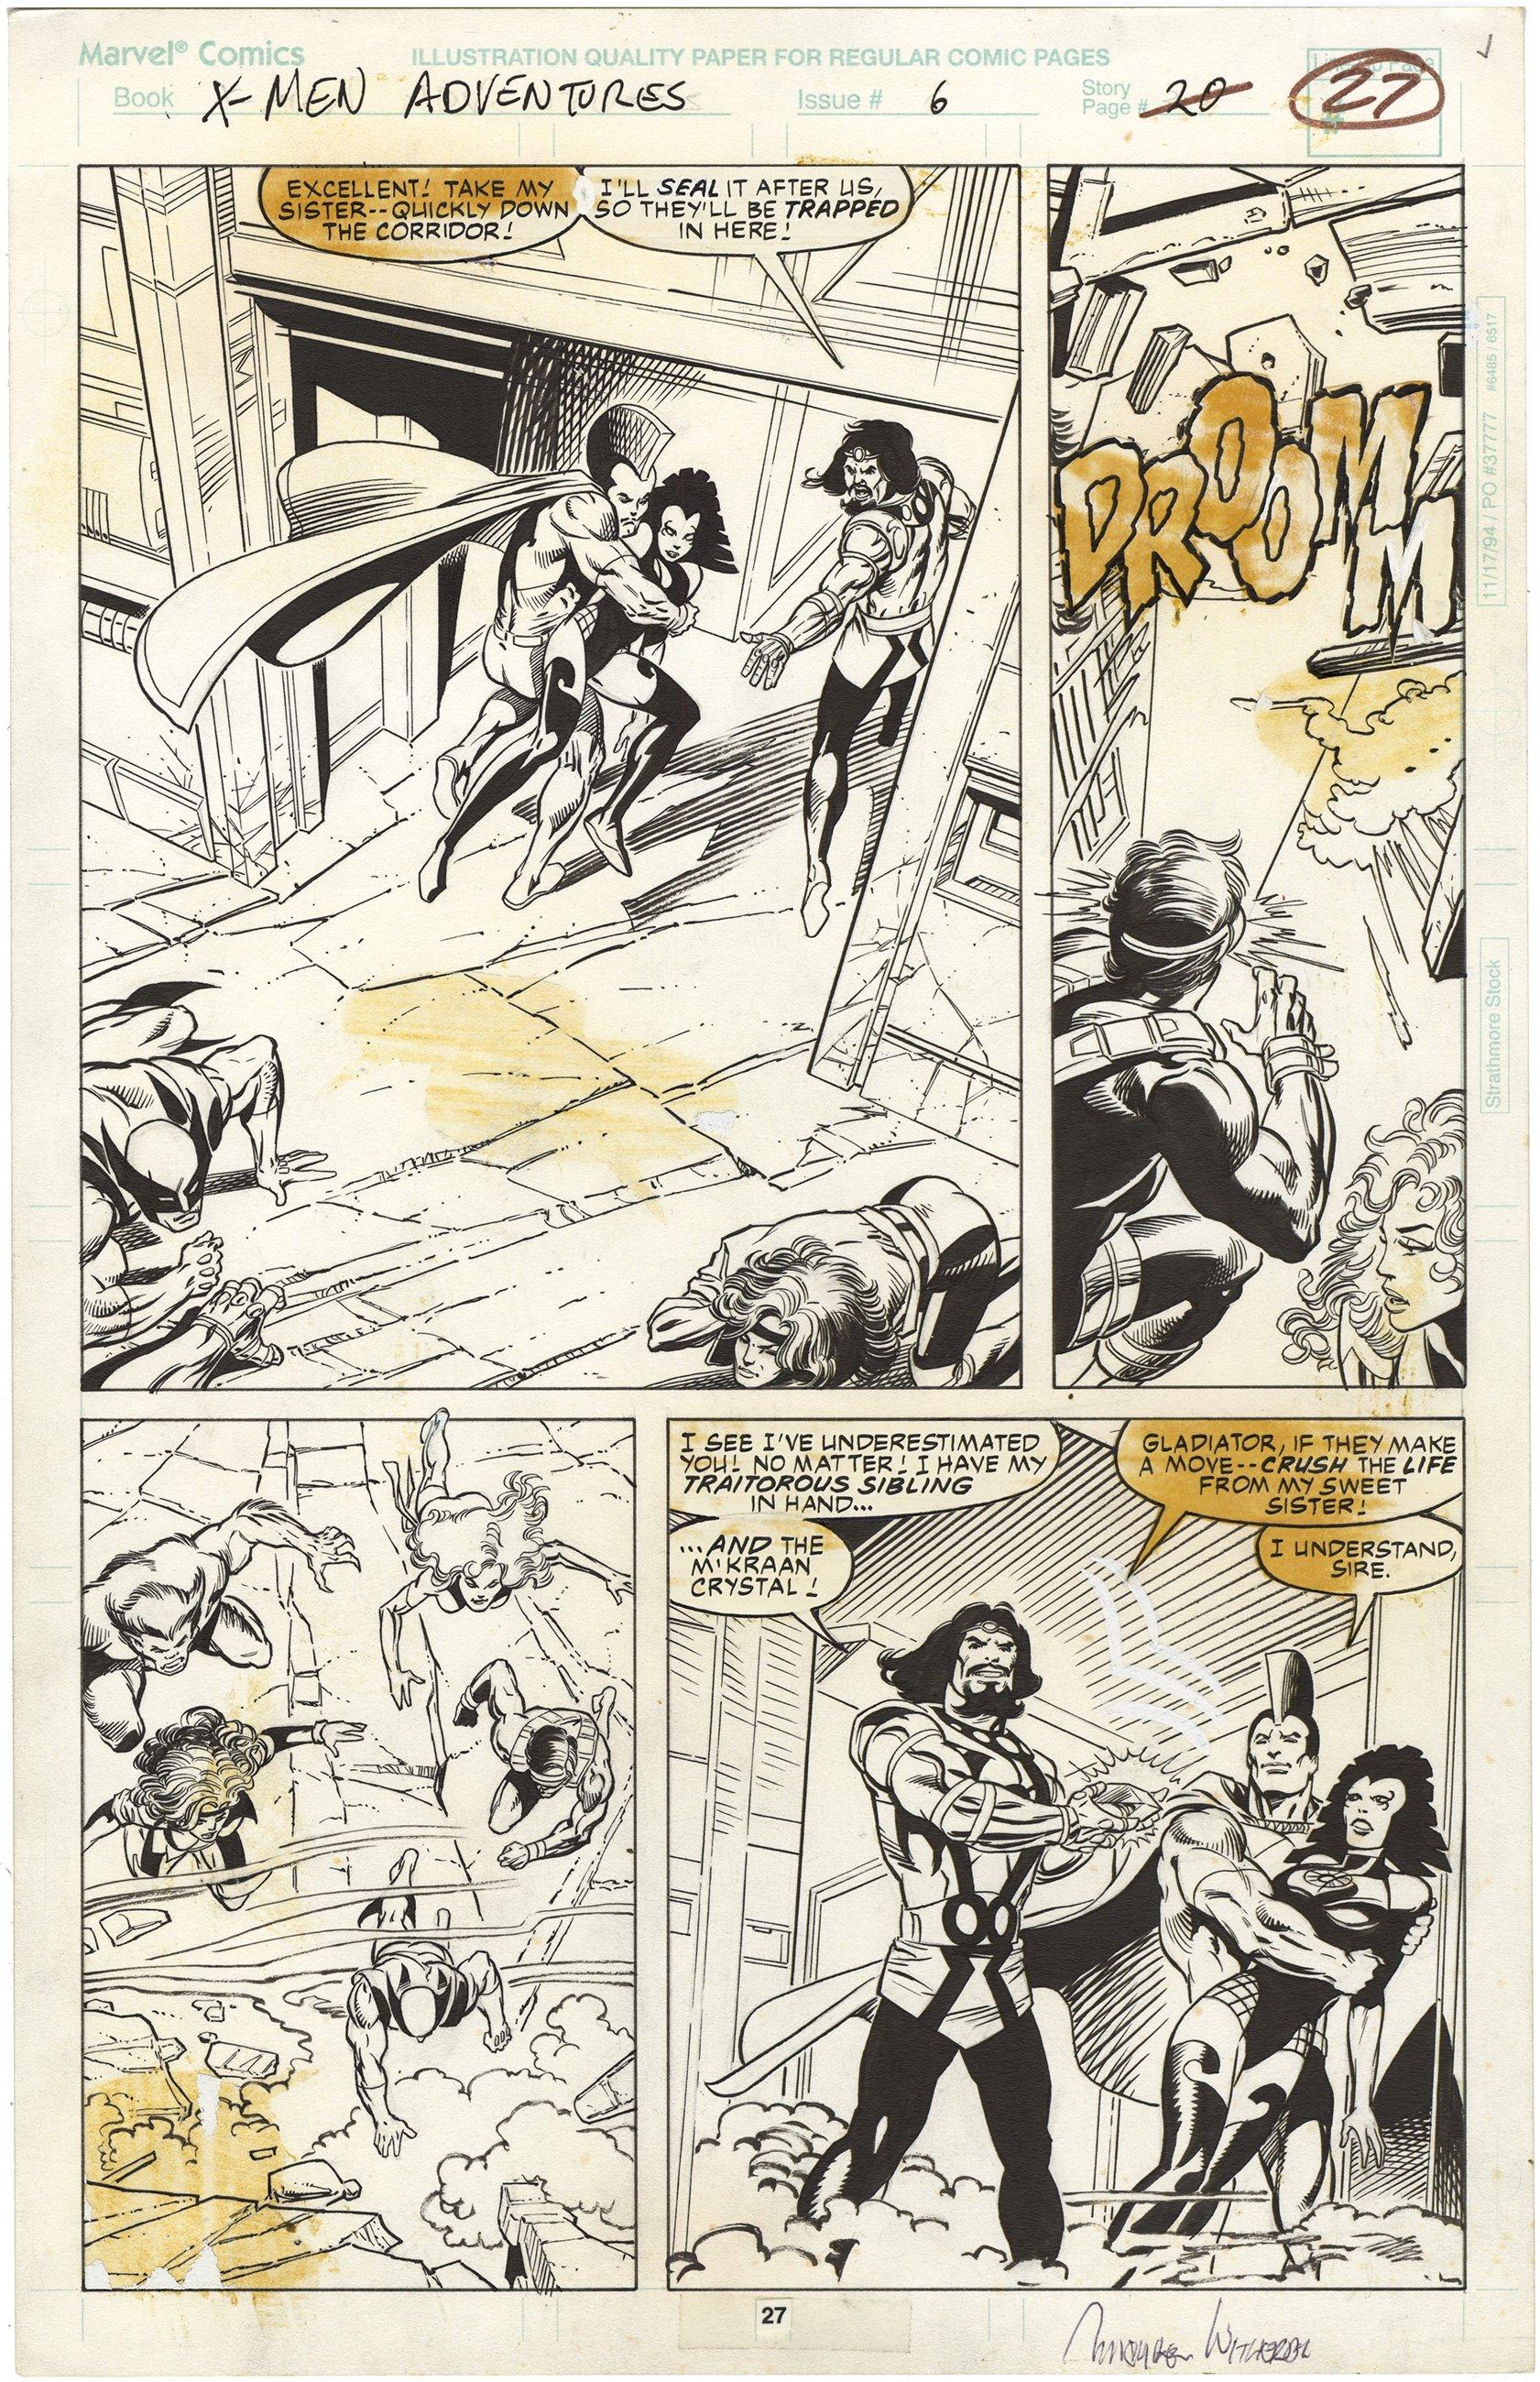 X-Men Adventures #6 p27